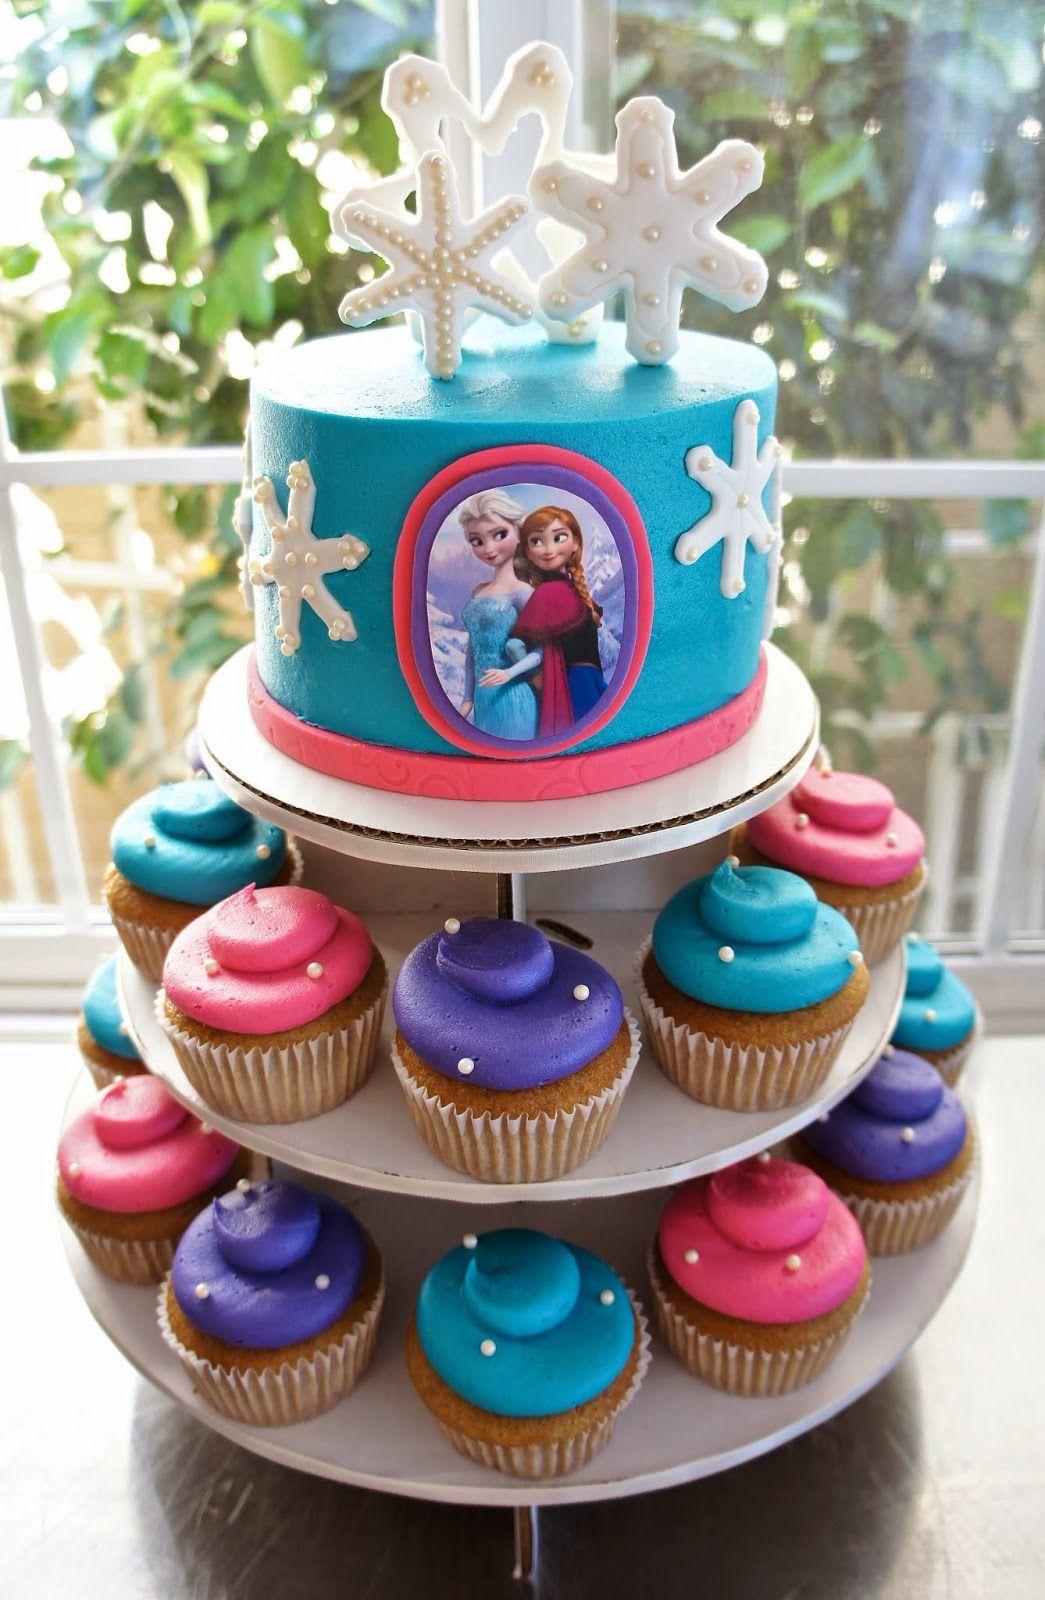 Frozen birthday party decorations ideas  FROZEN CAKE by Half Baked Co  frozen birthday  Pinterest